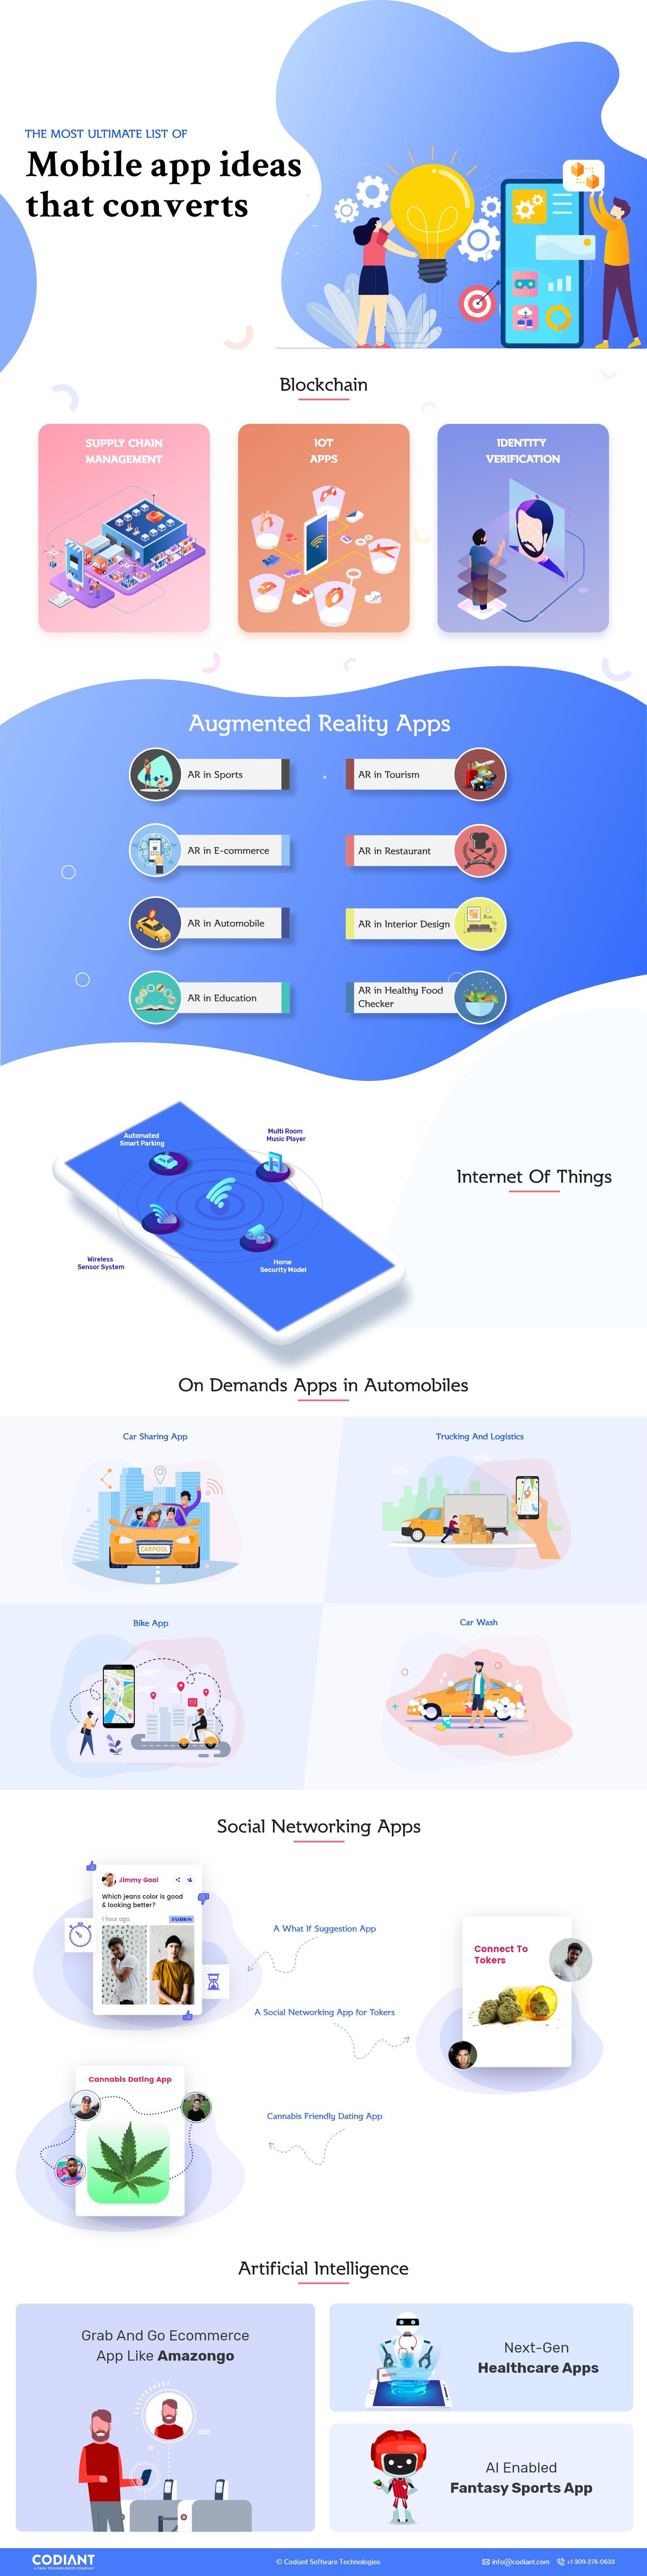 Mobile app ideas 2020 in 2020 Mobile app, App